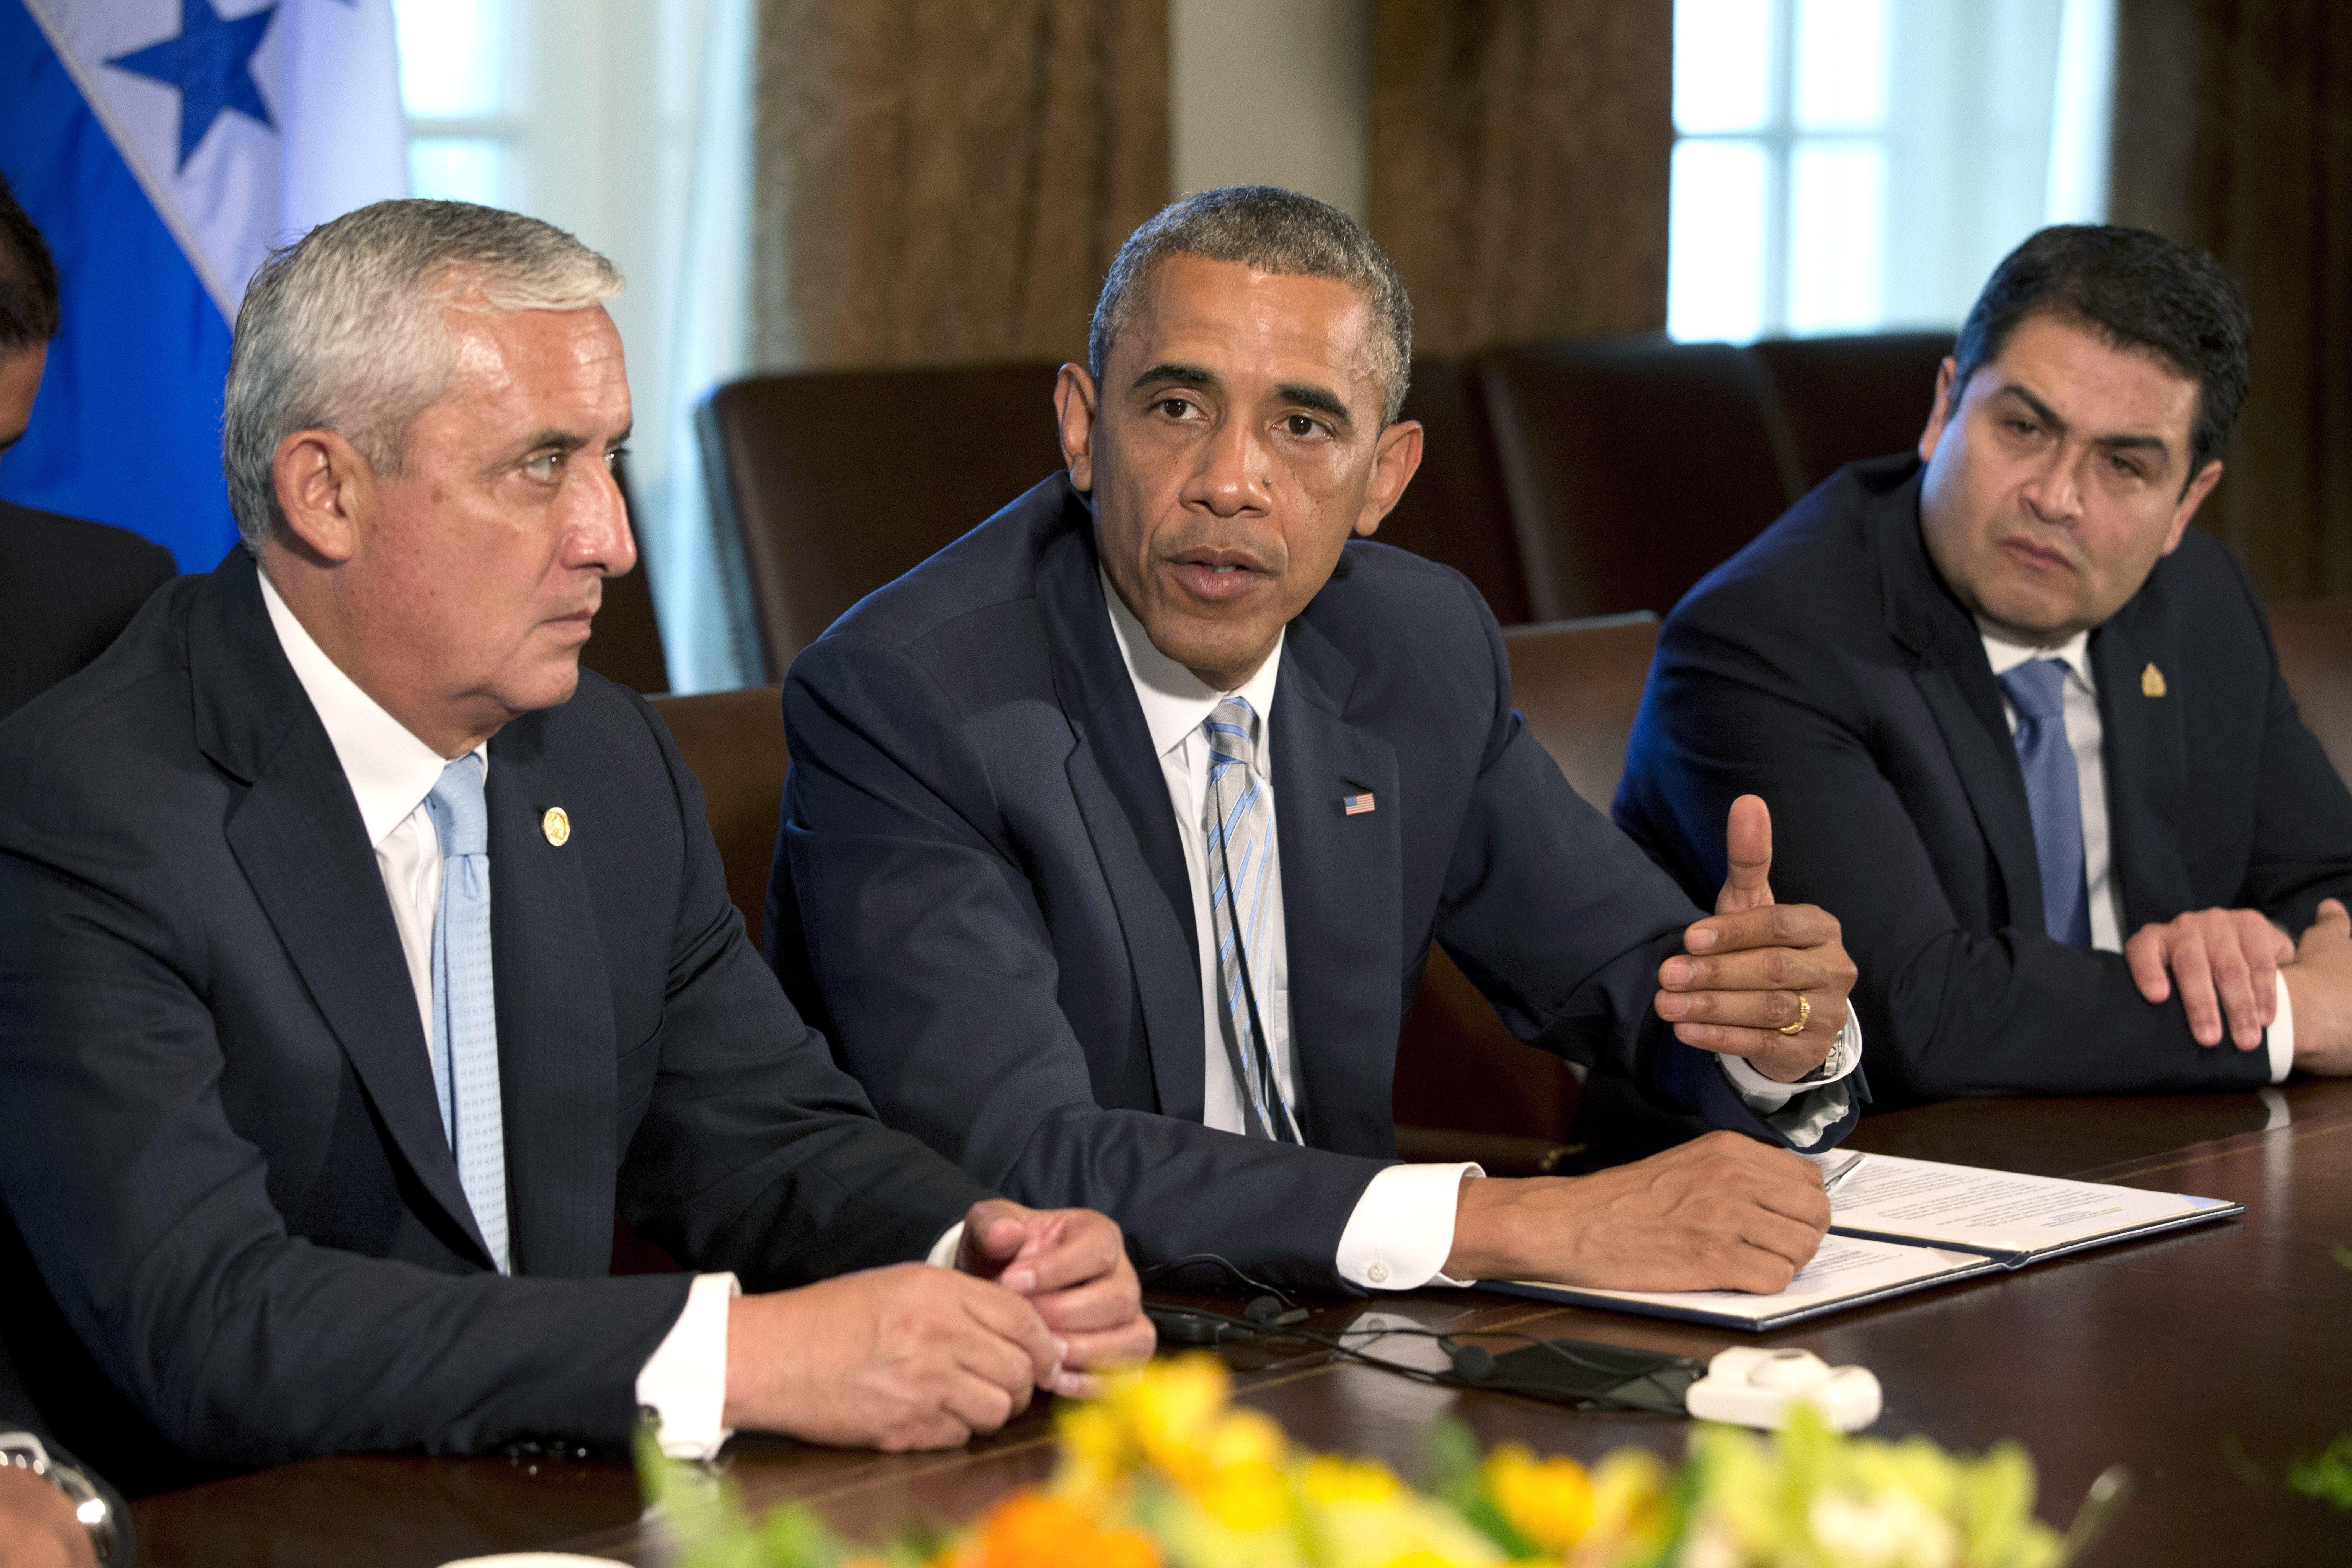 Image: Otto Perez Molina, Barack Obama, Juan Hernandez